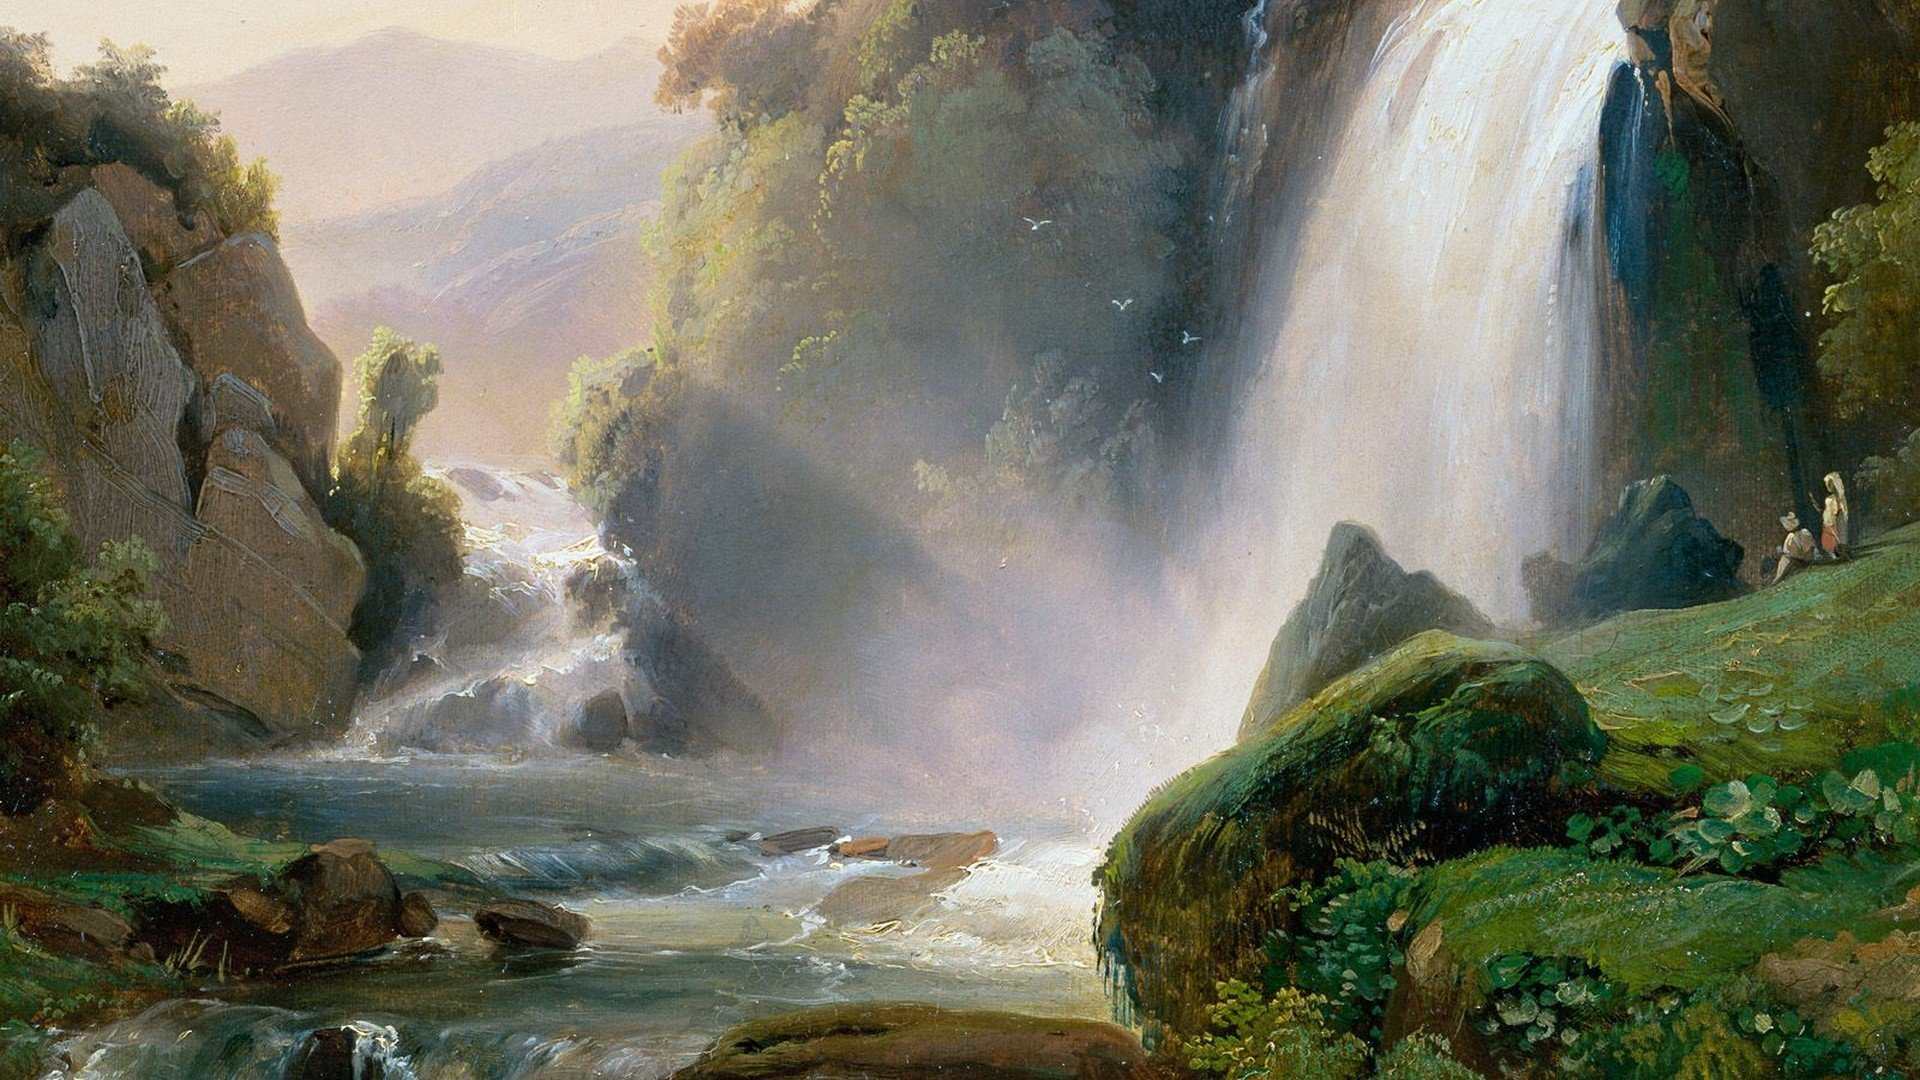 [44+] Free Waterfall Wallpaper 1920x1080 On WallpaperSafari